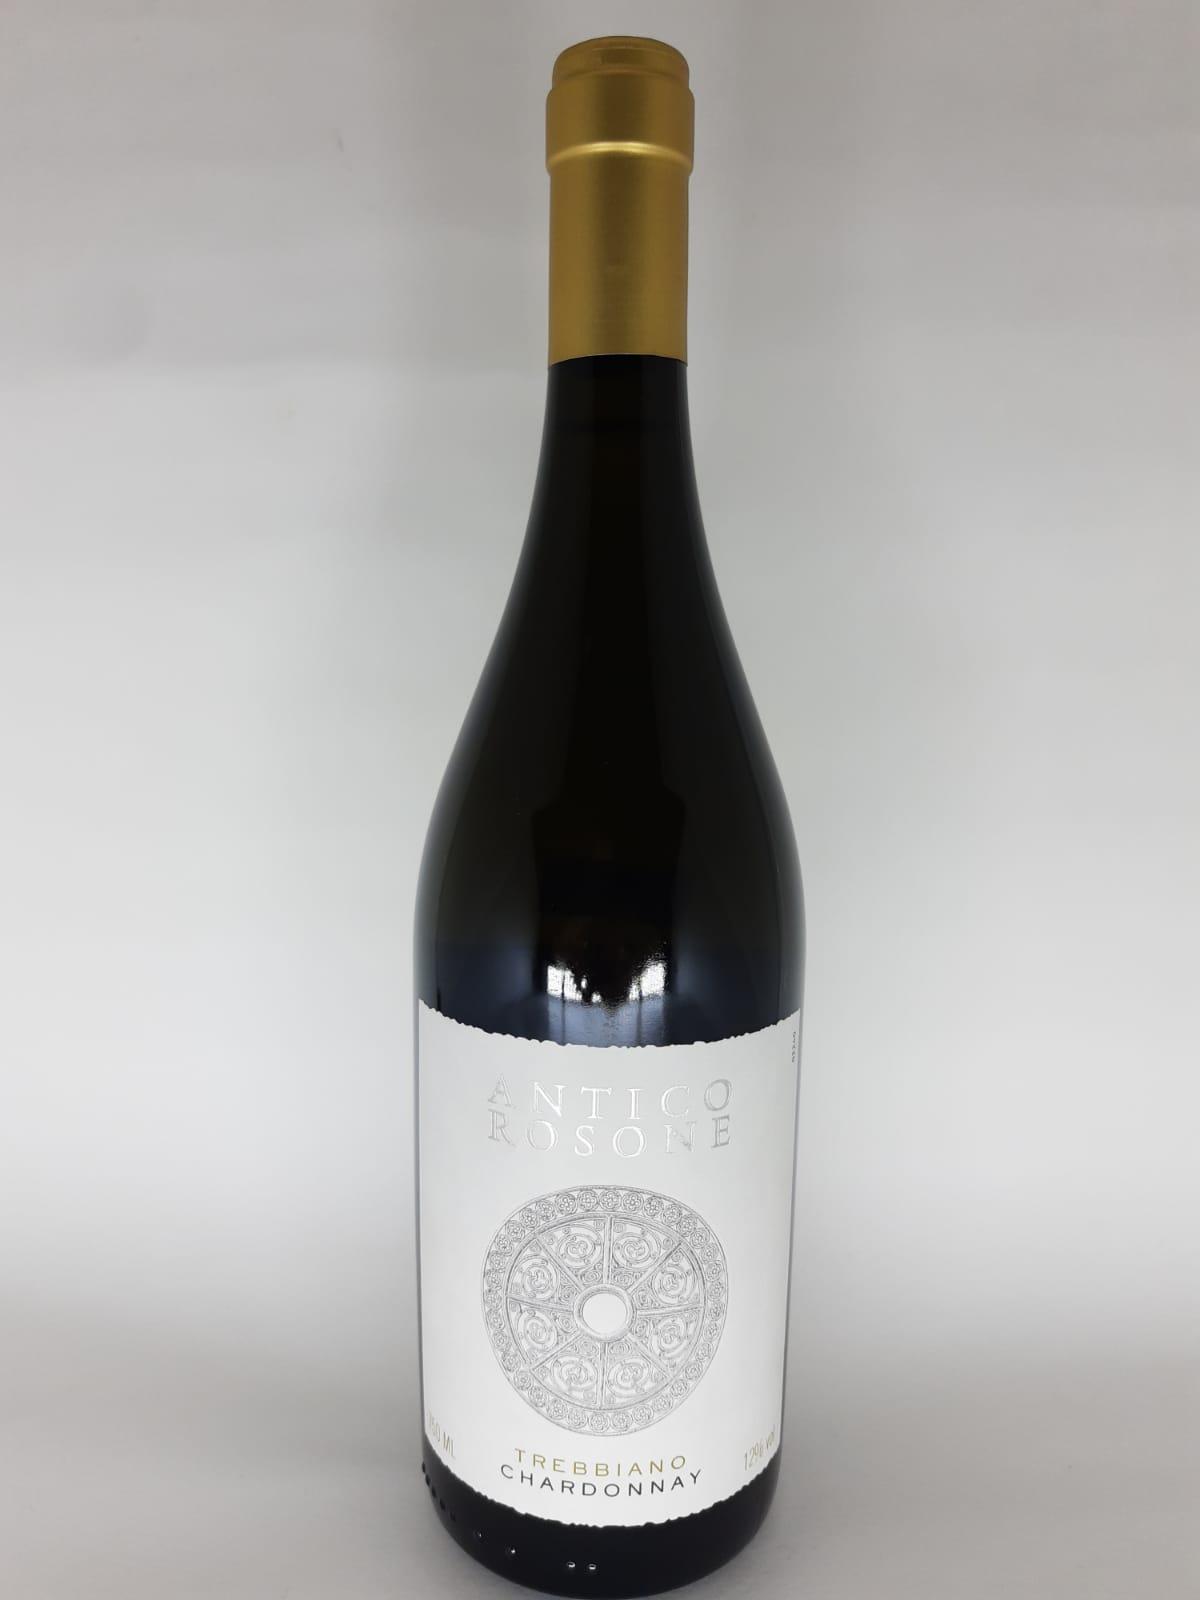 Vinho Caviro Antico Rosone Trebibiano/Chardonnay 750ml